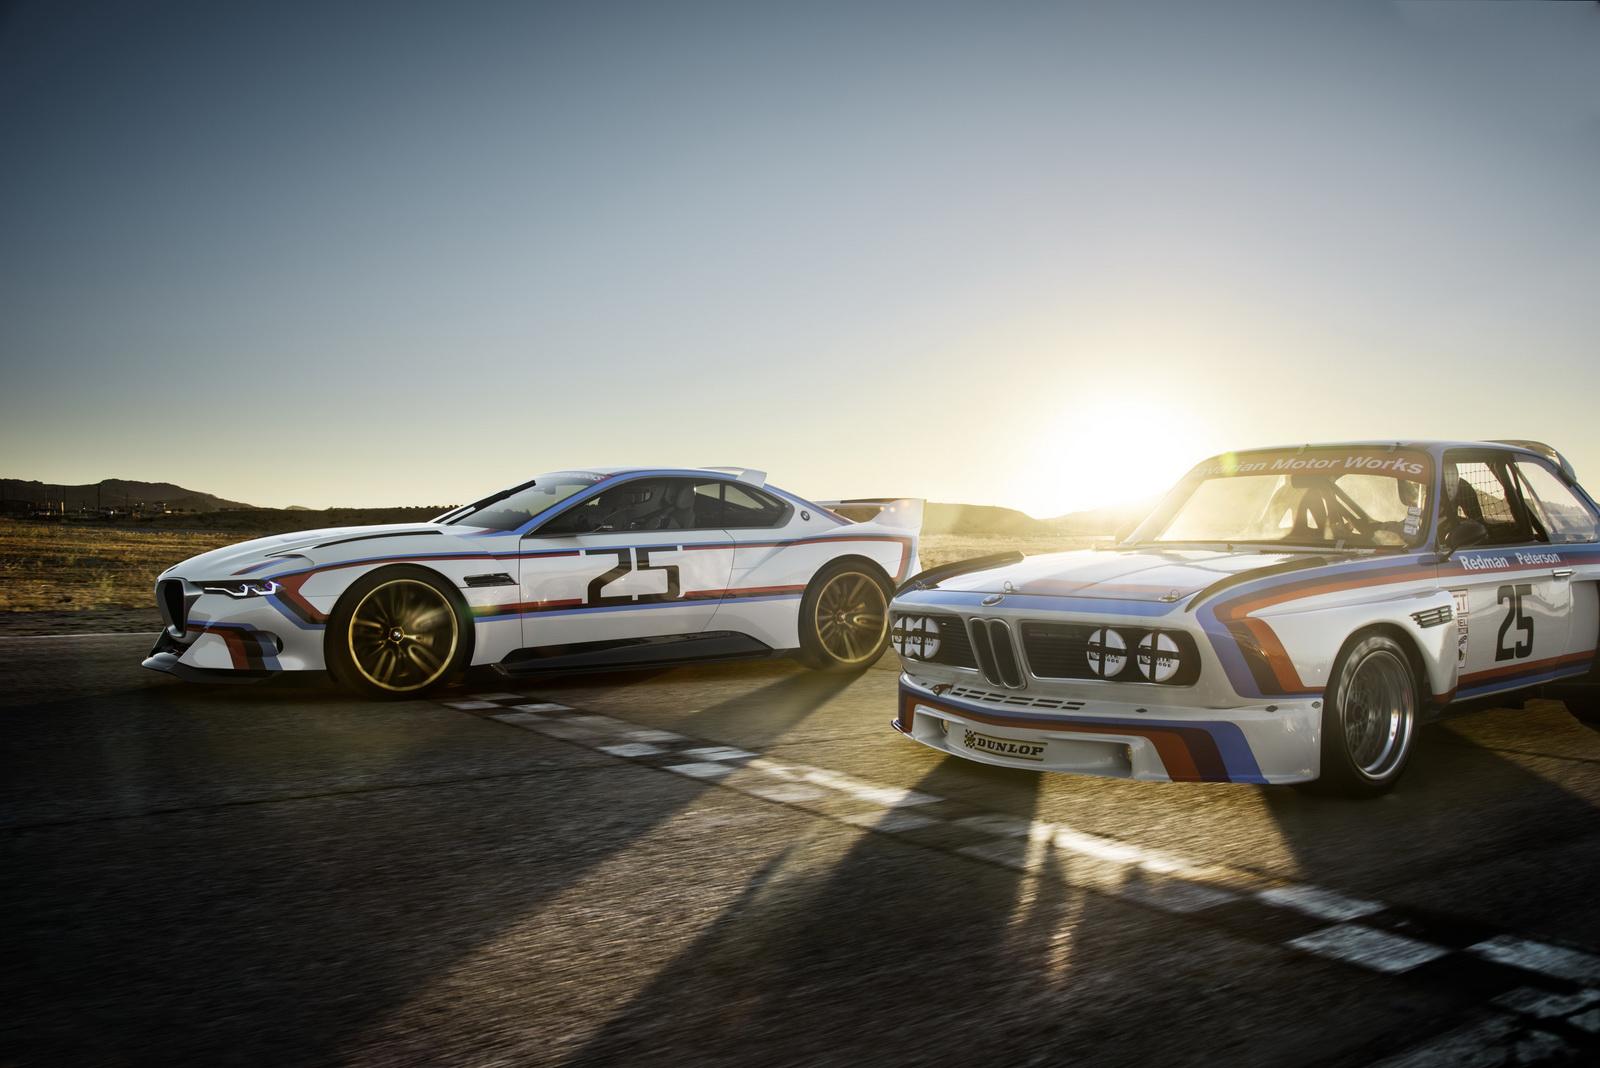 BMW-30-Hommage-R-Concept-15